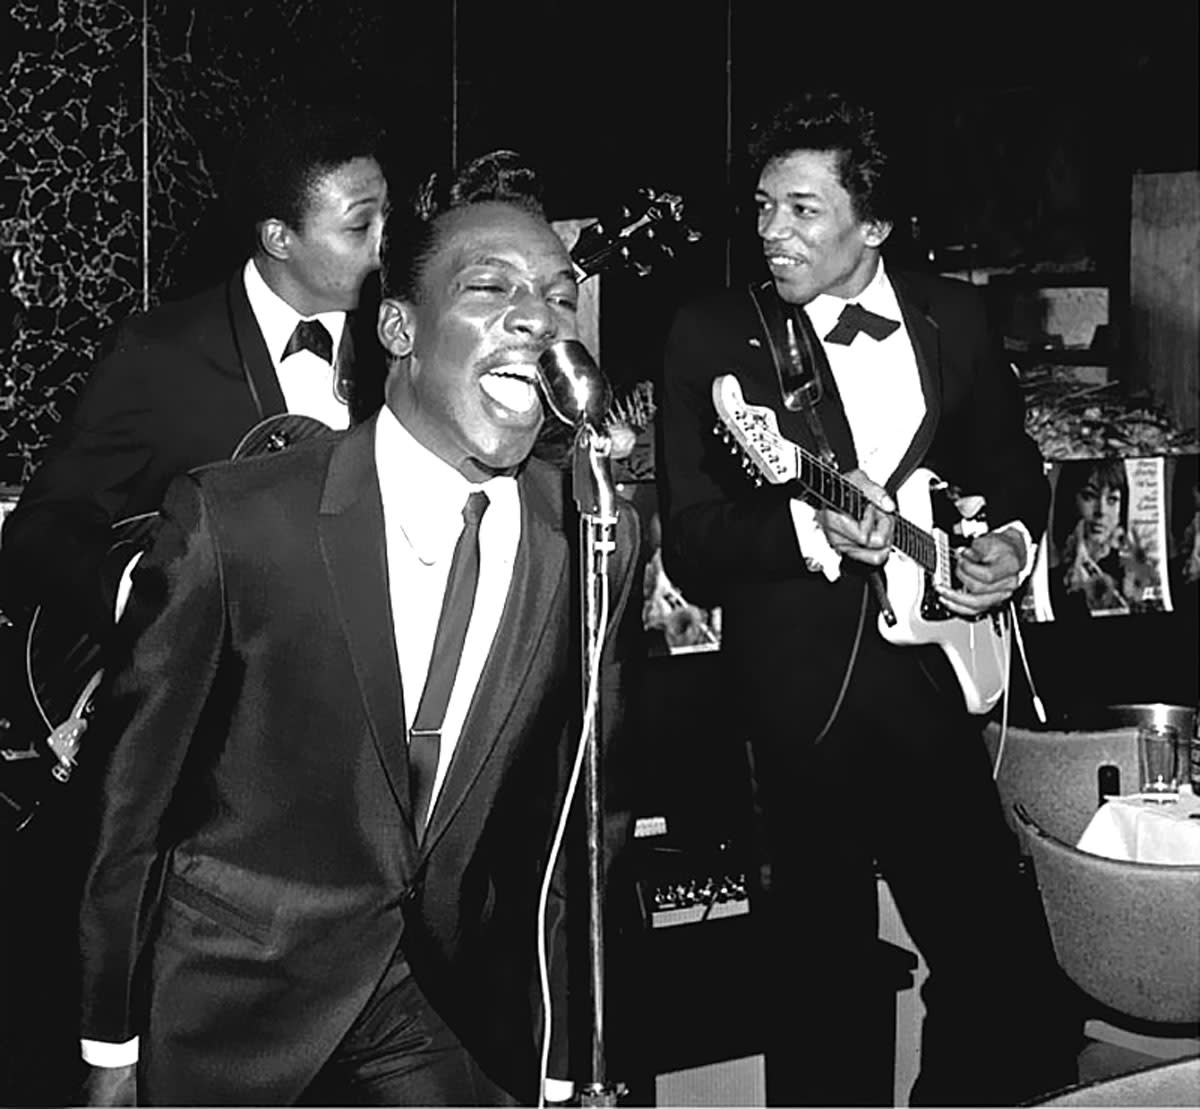 Wilson Pickett and Jimi Hendrix